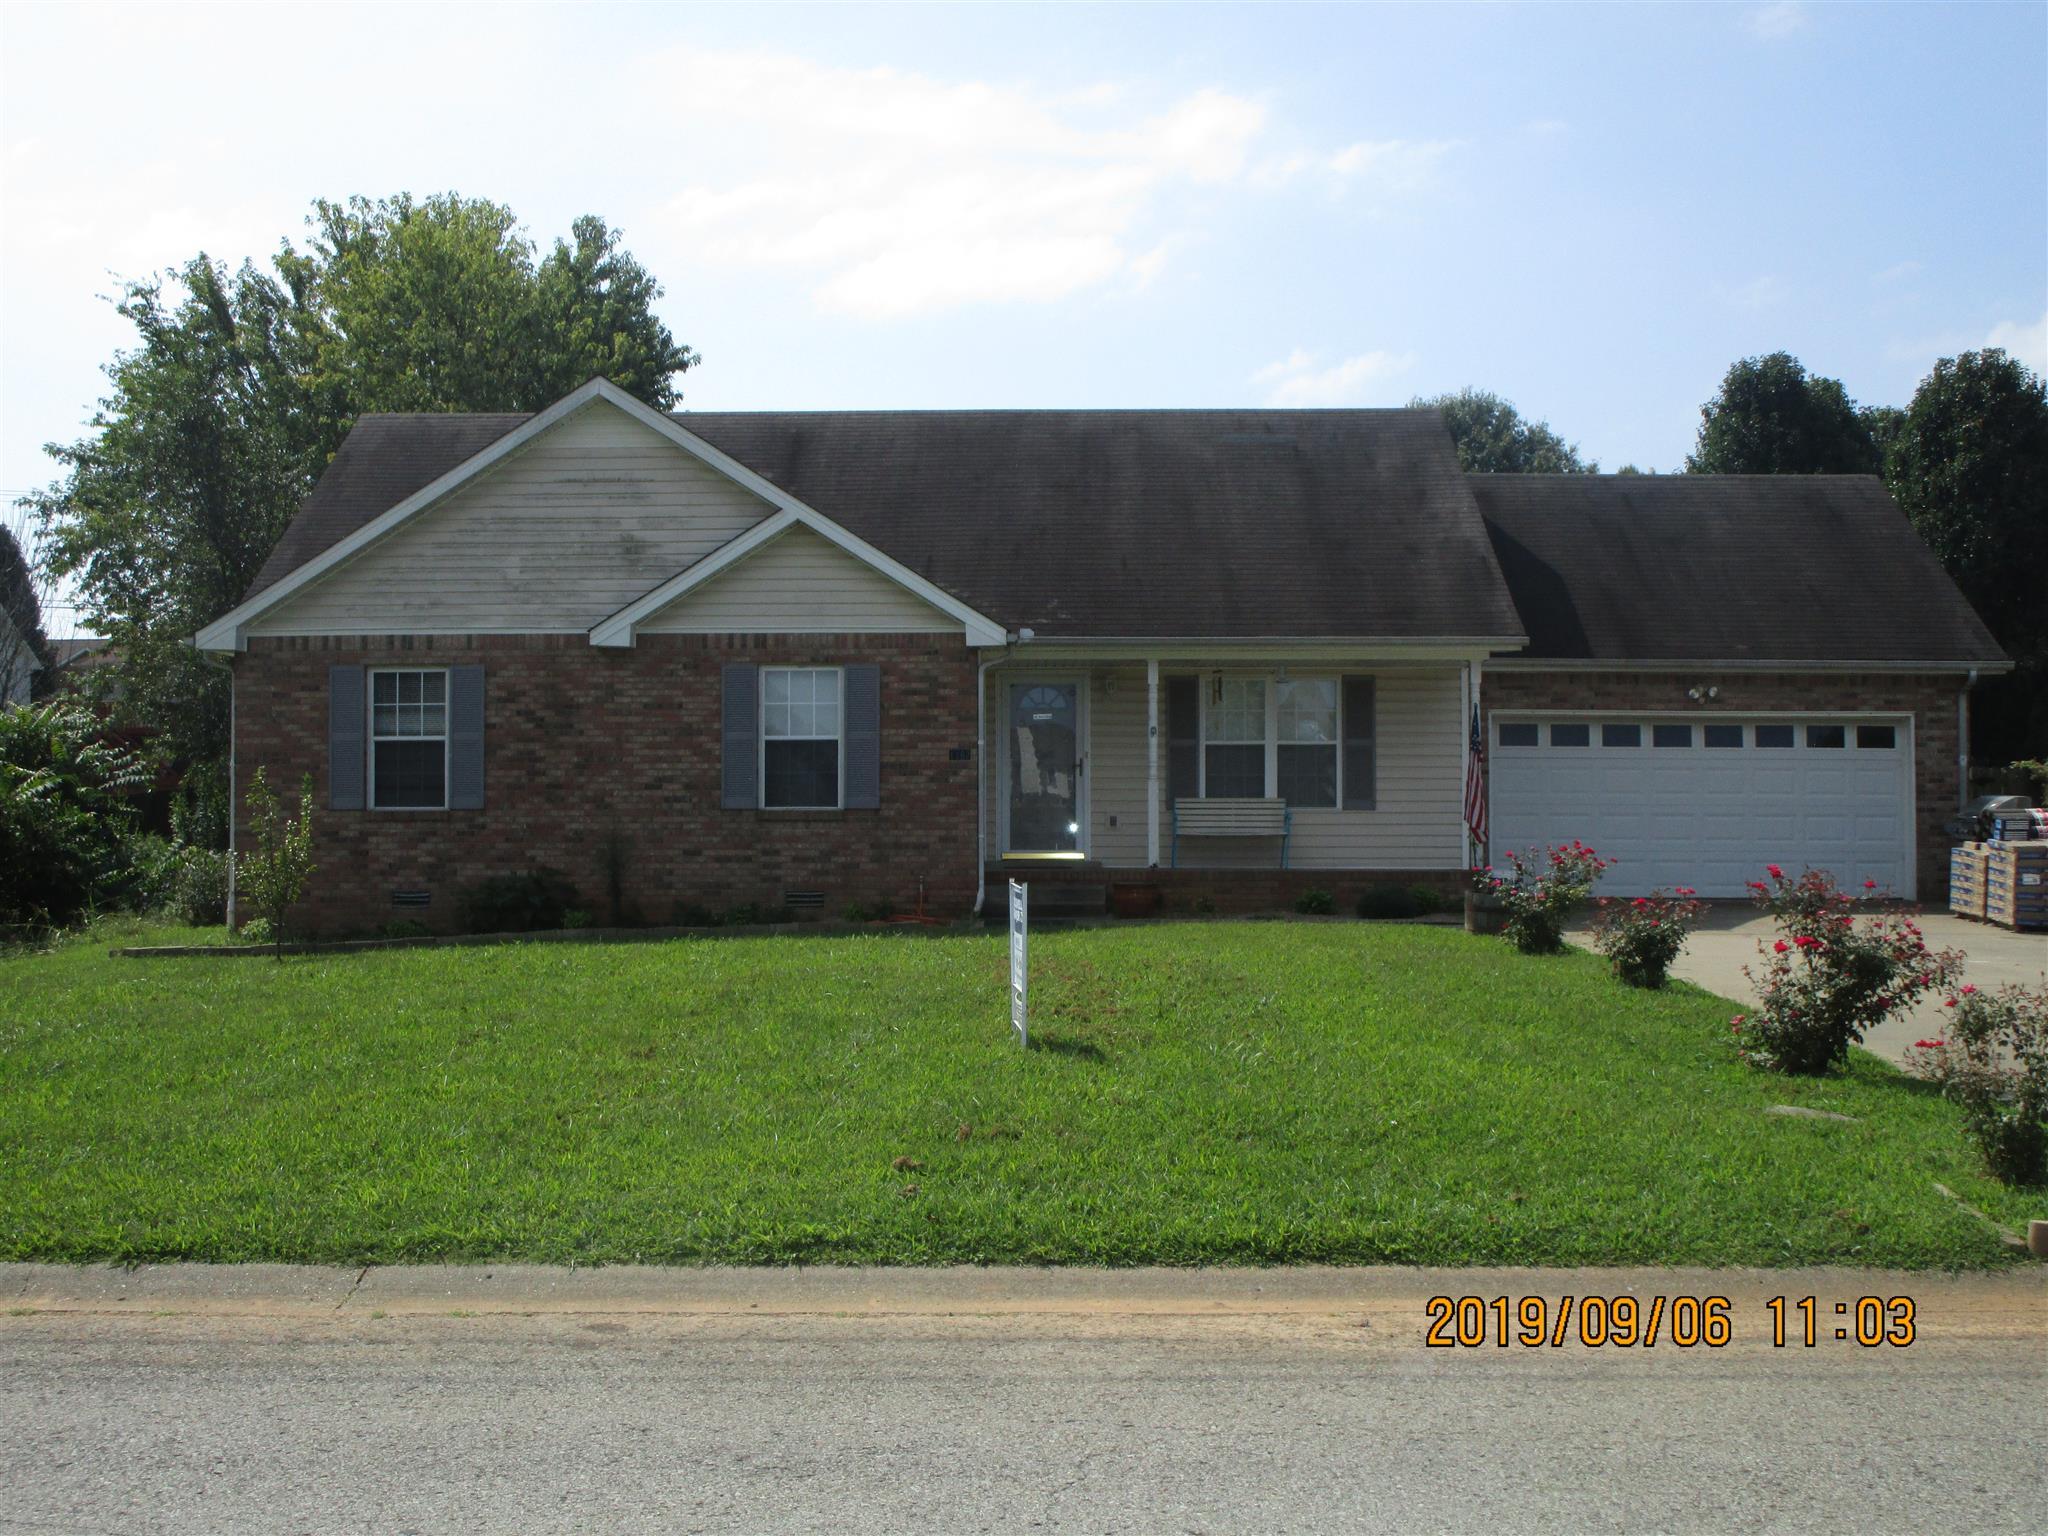 1782 Butternut Dr, Clarksville, TN 37042 - Clarksville, TN real estate listing